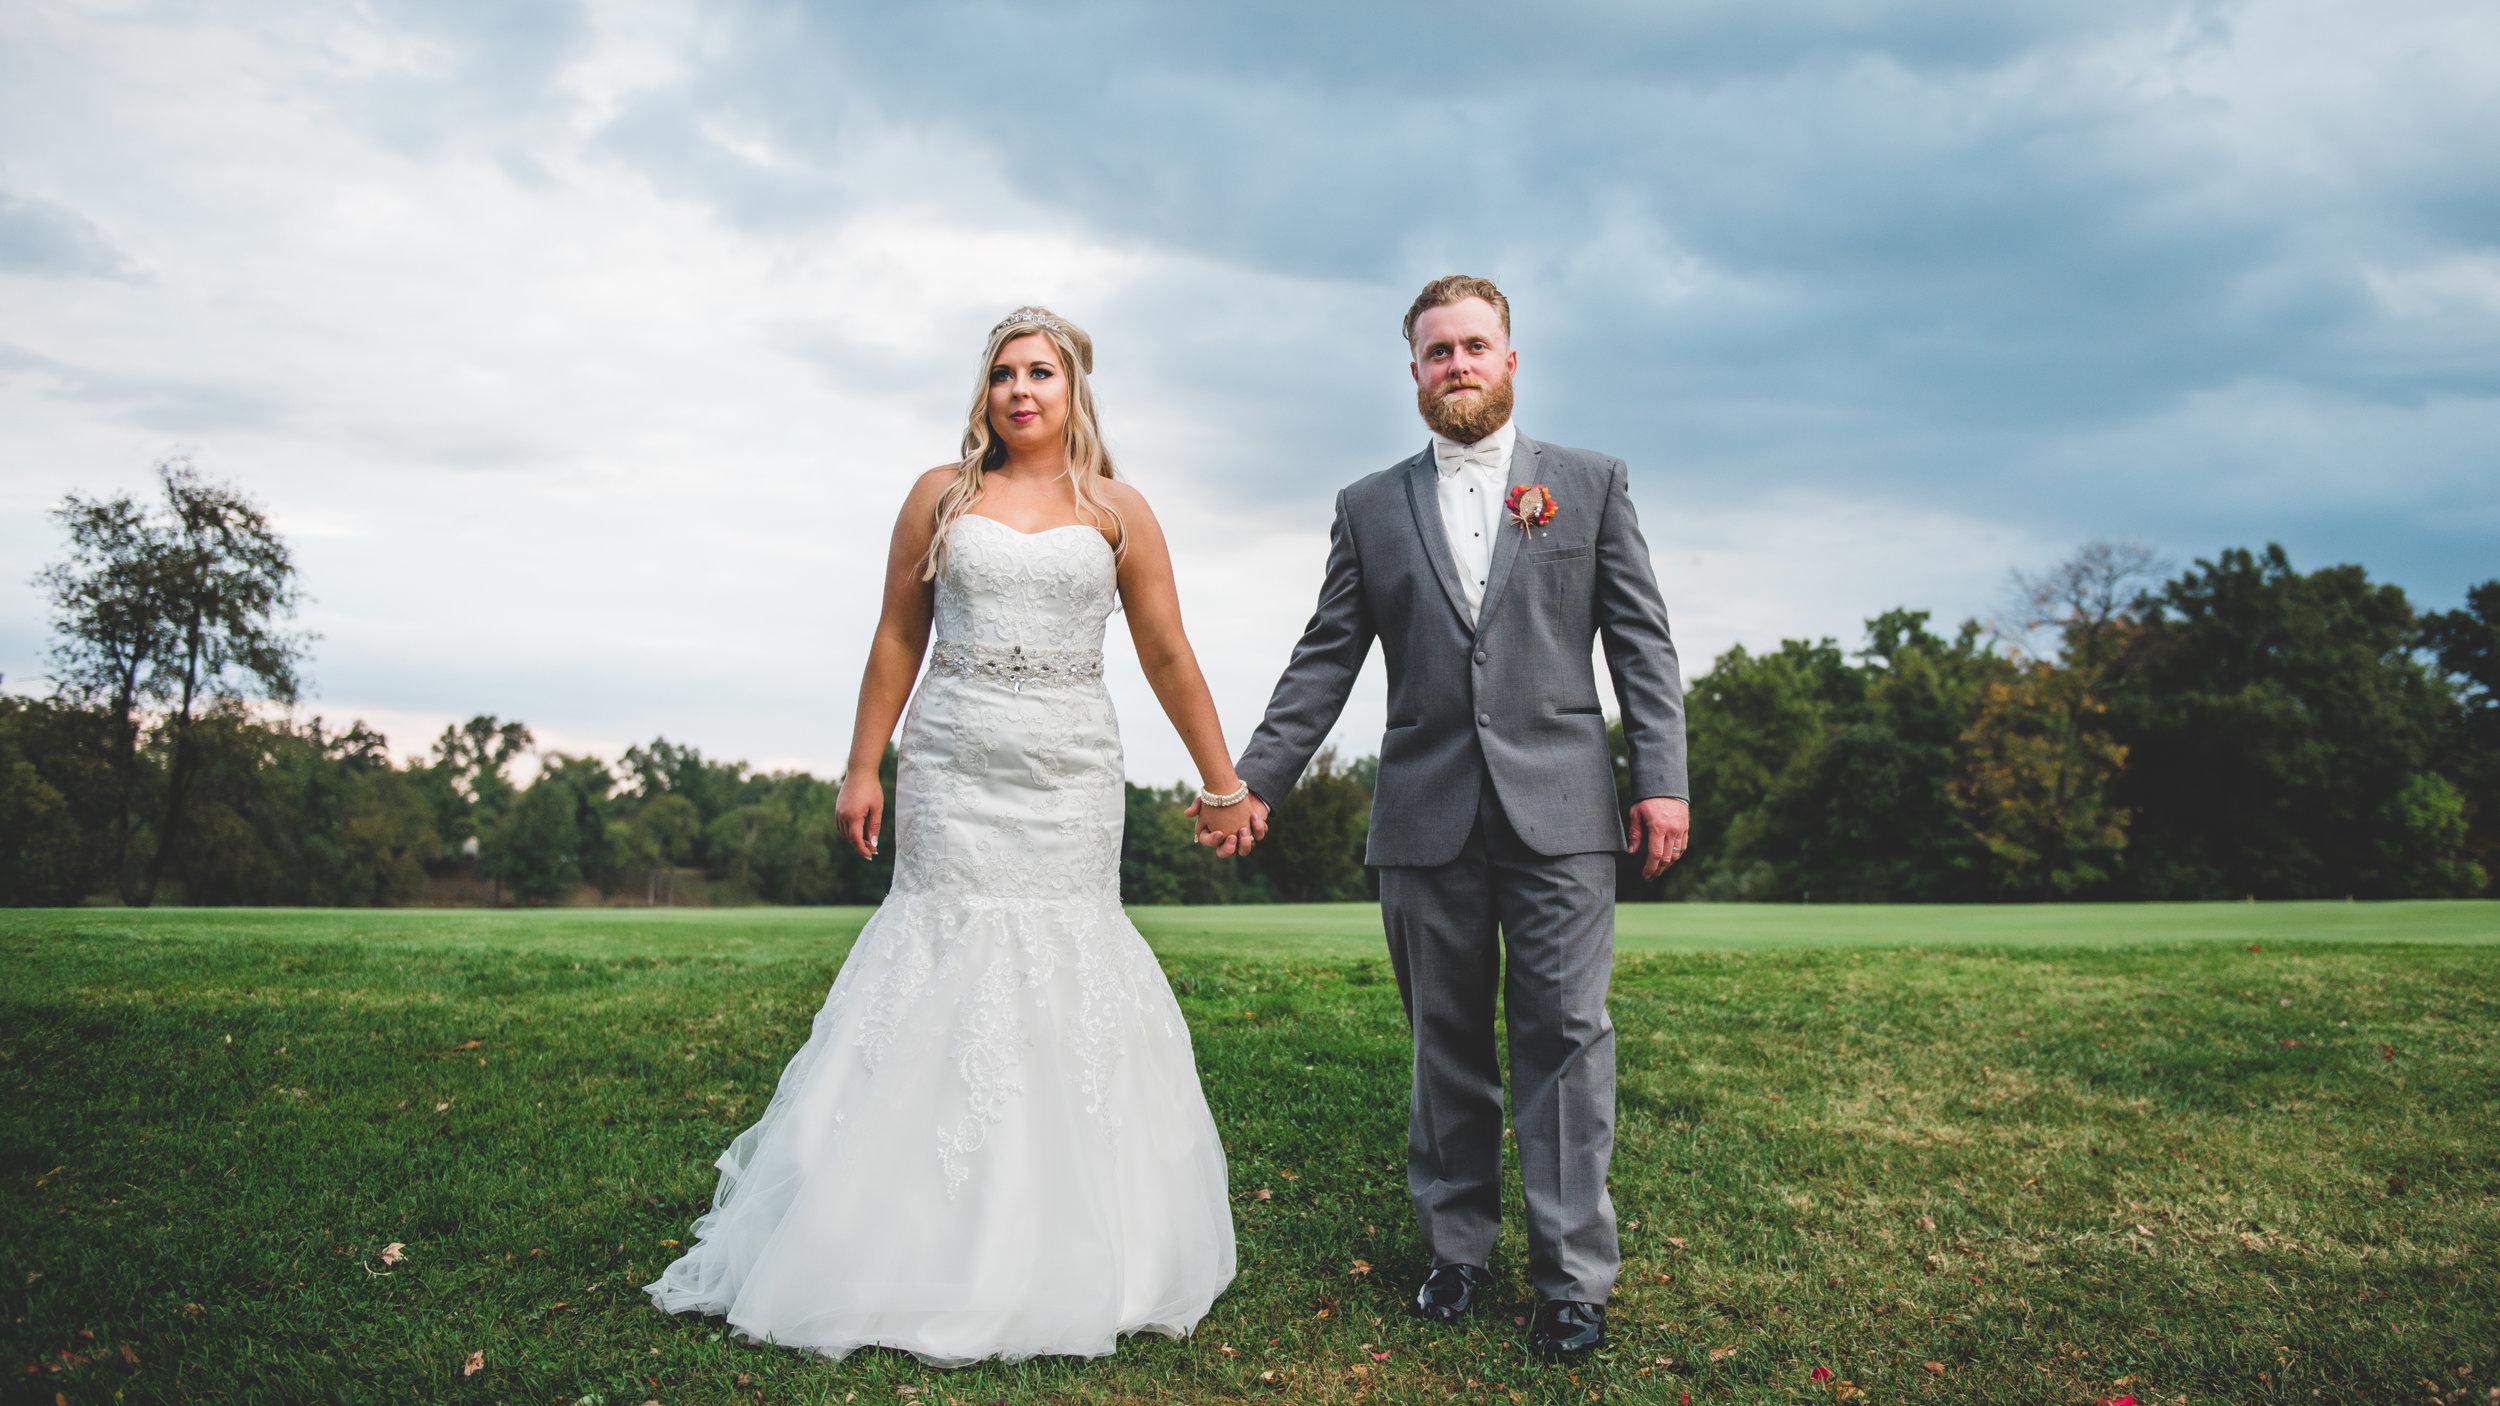 CCW - Creative Cure Weddings - Marissa and Nick - Southern Illinois Wedding Photography-9.jpg